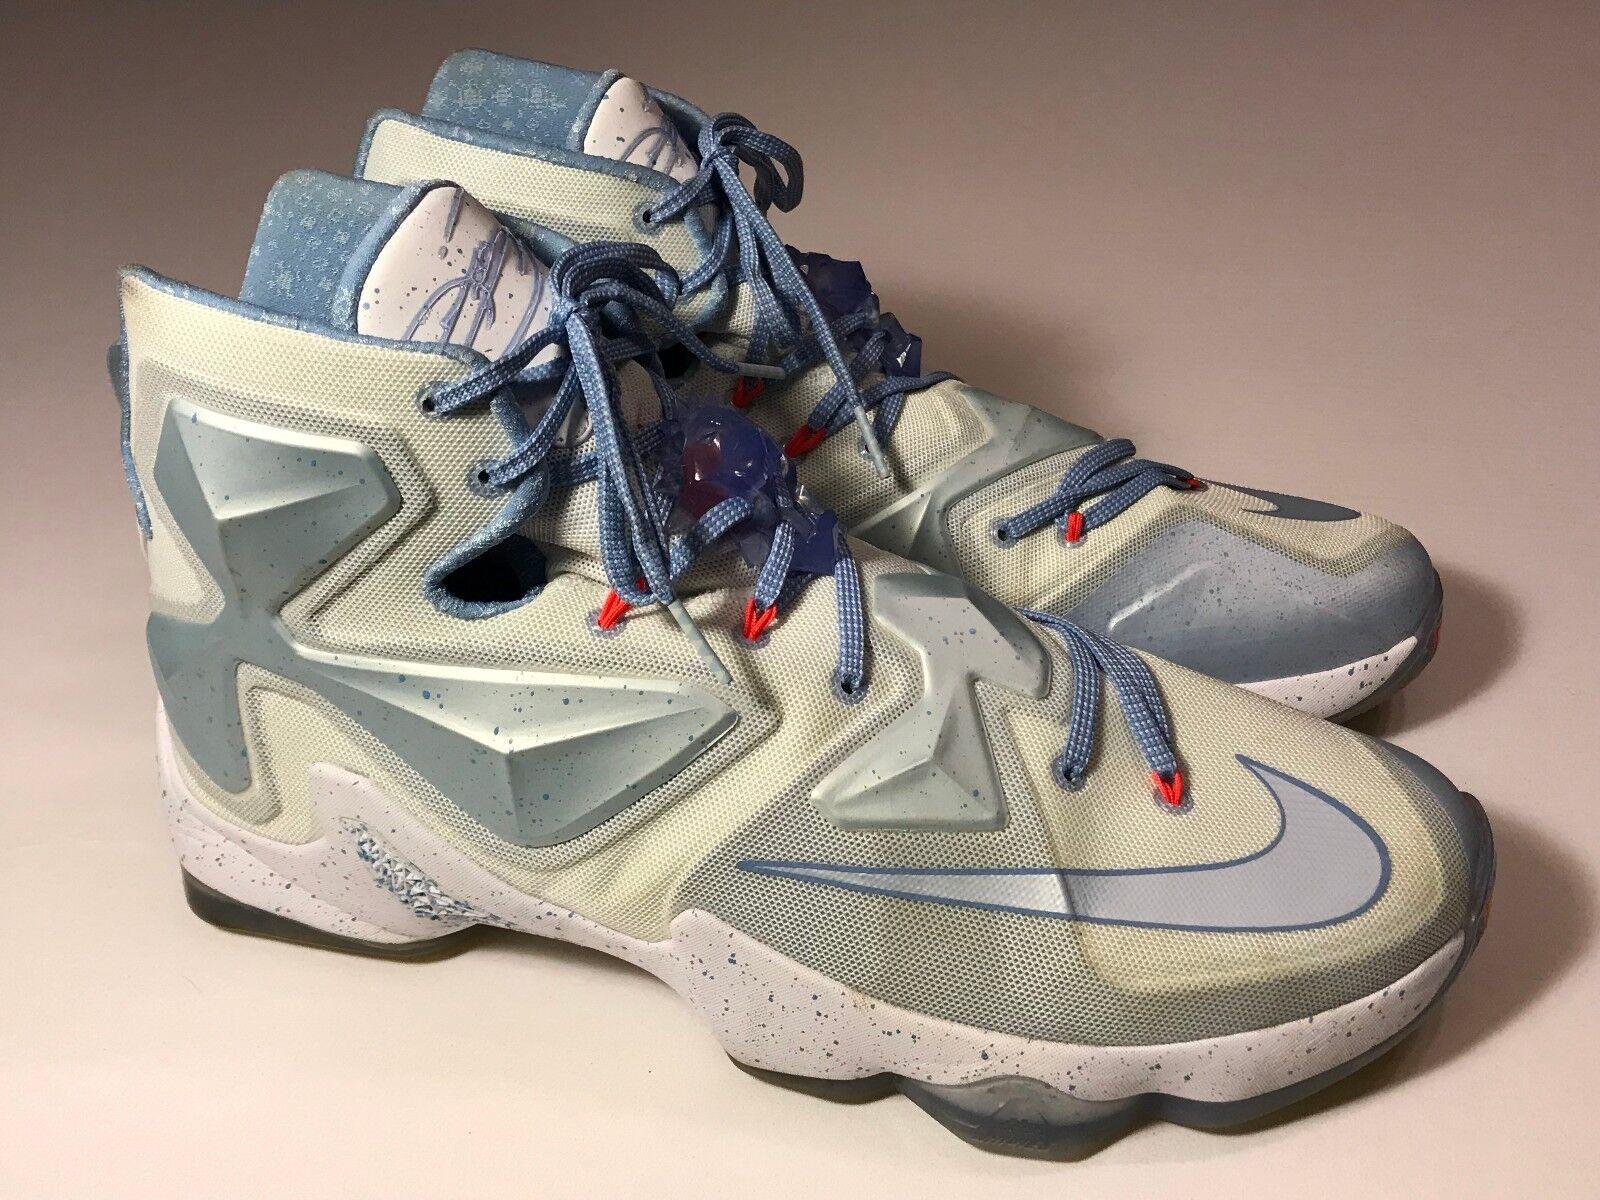 Nike lebron xiii 13 natale (816278-144) blu ghiaccio scarpe da basket uomini numero 13